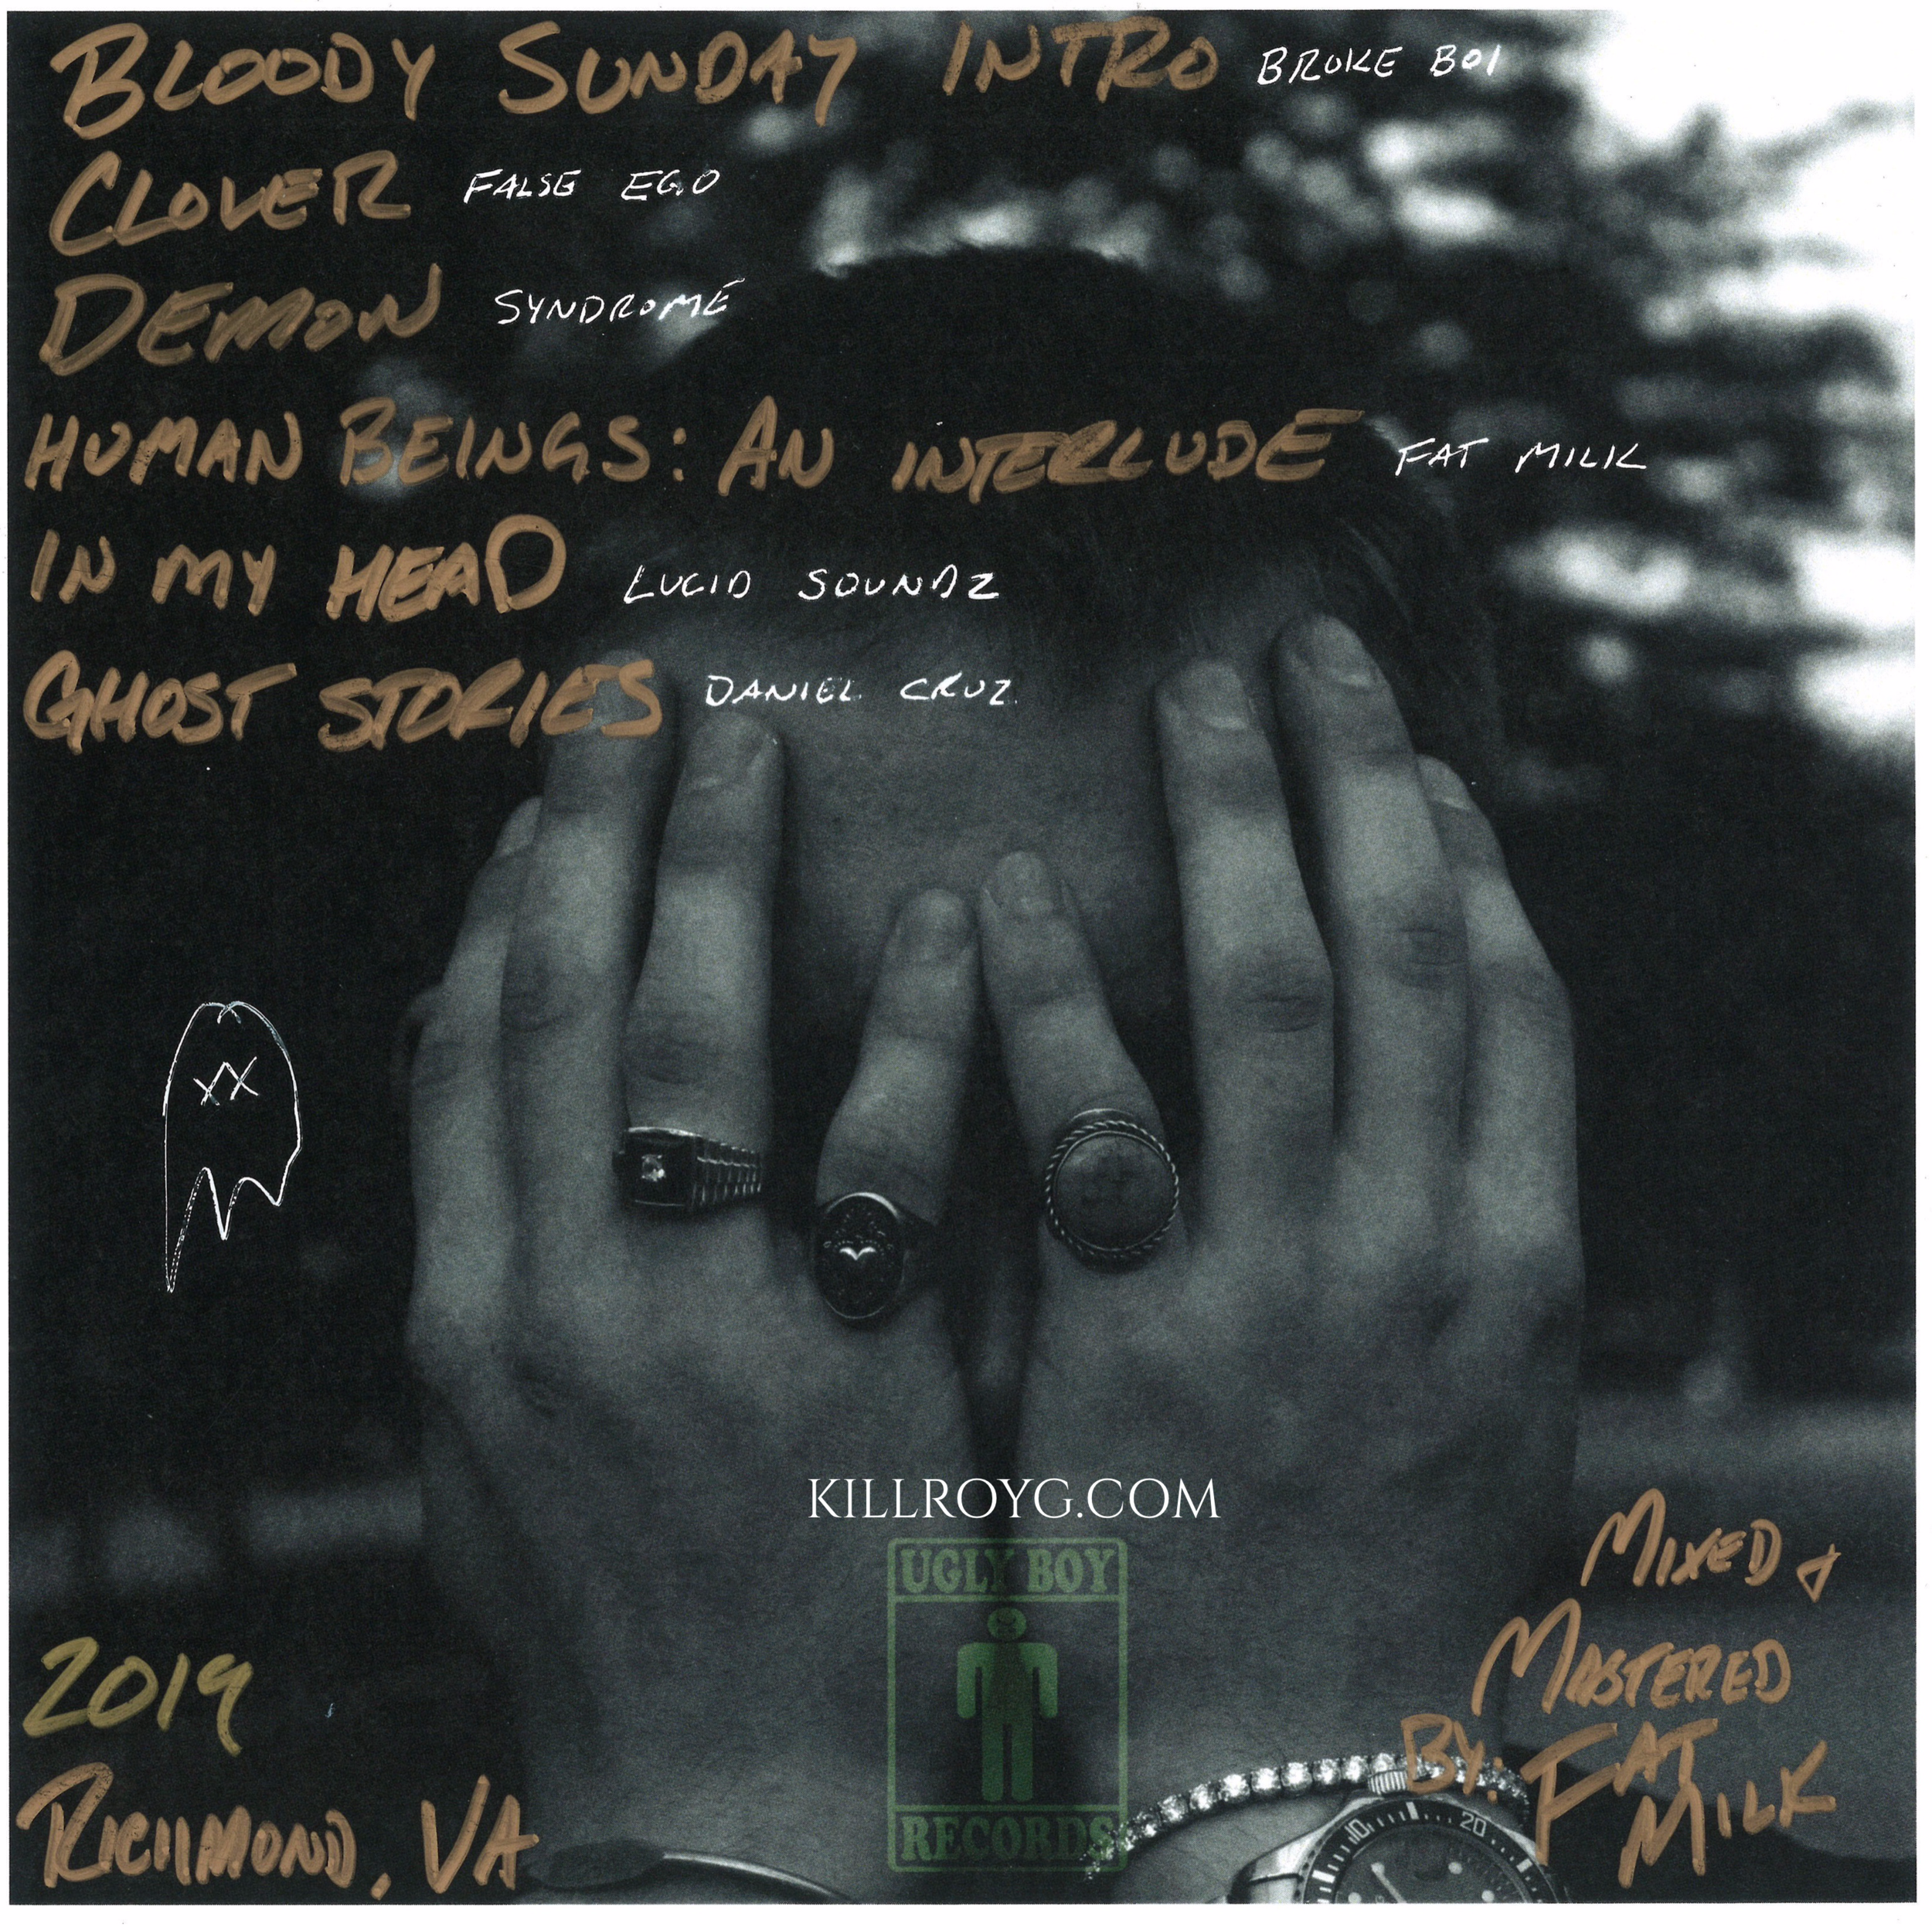 "CHECK OUT RICHMOND VIRginia's Very own Killroy the Ghost (KillroyG) Album ""Bloody sunday"" -"